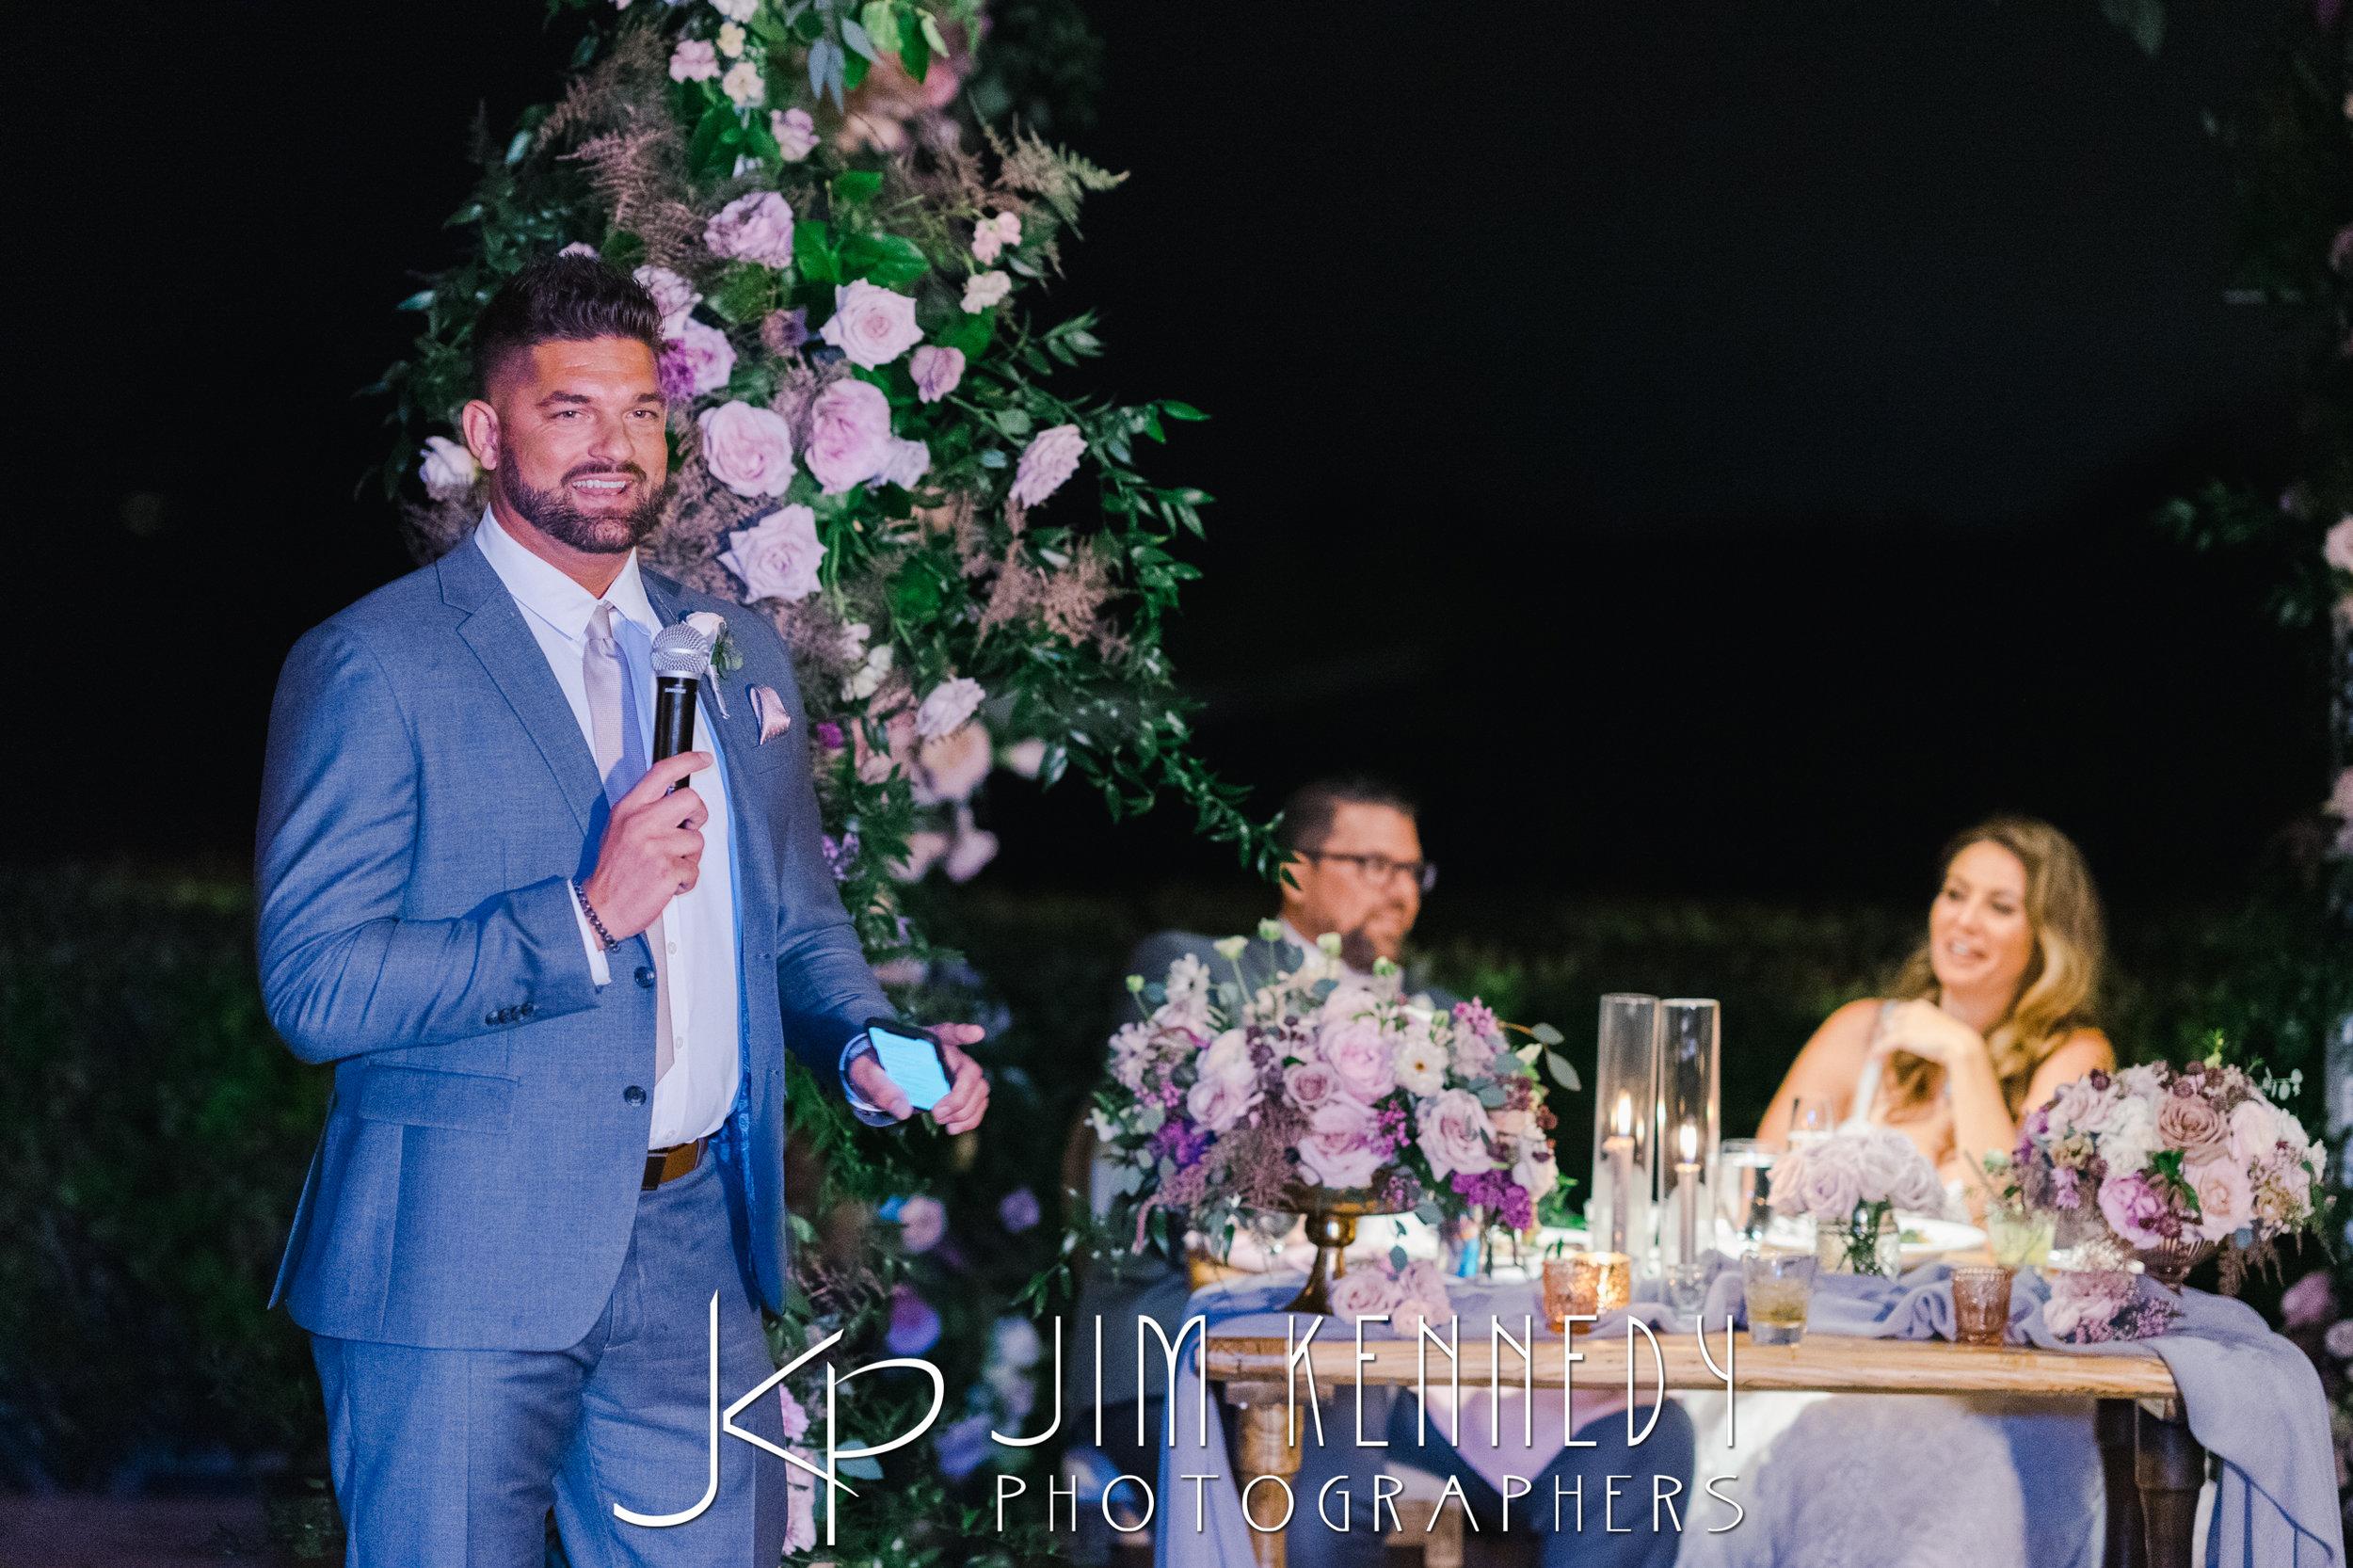 pelican-hill-wedding-jim-kenedy-photographers_0241.JPG